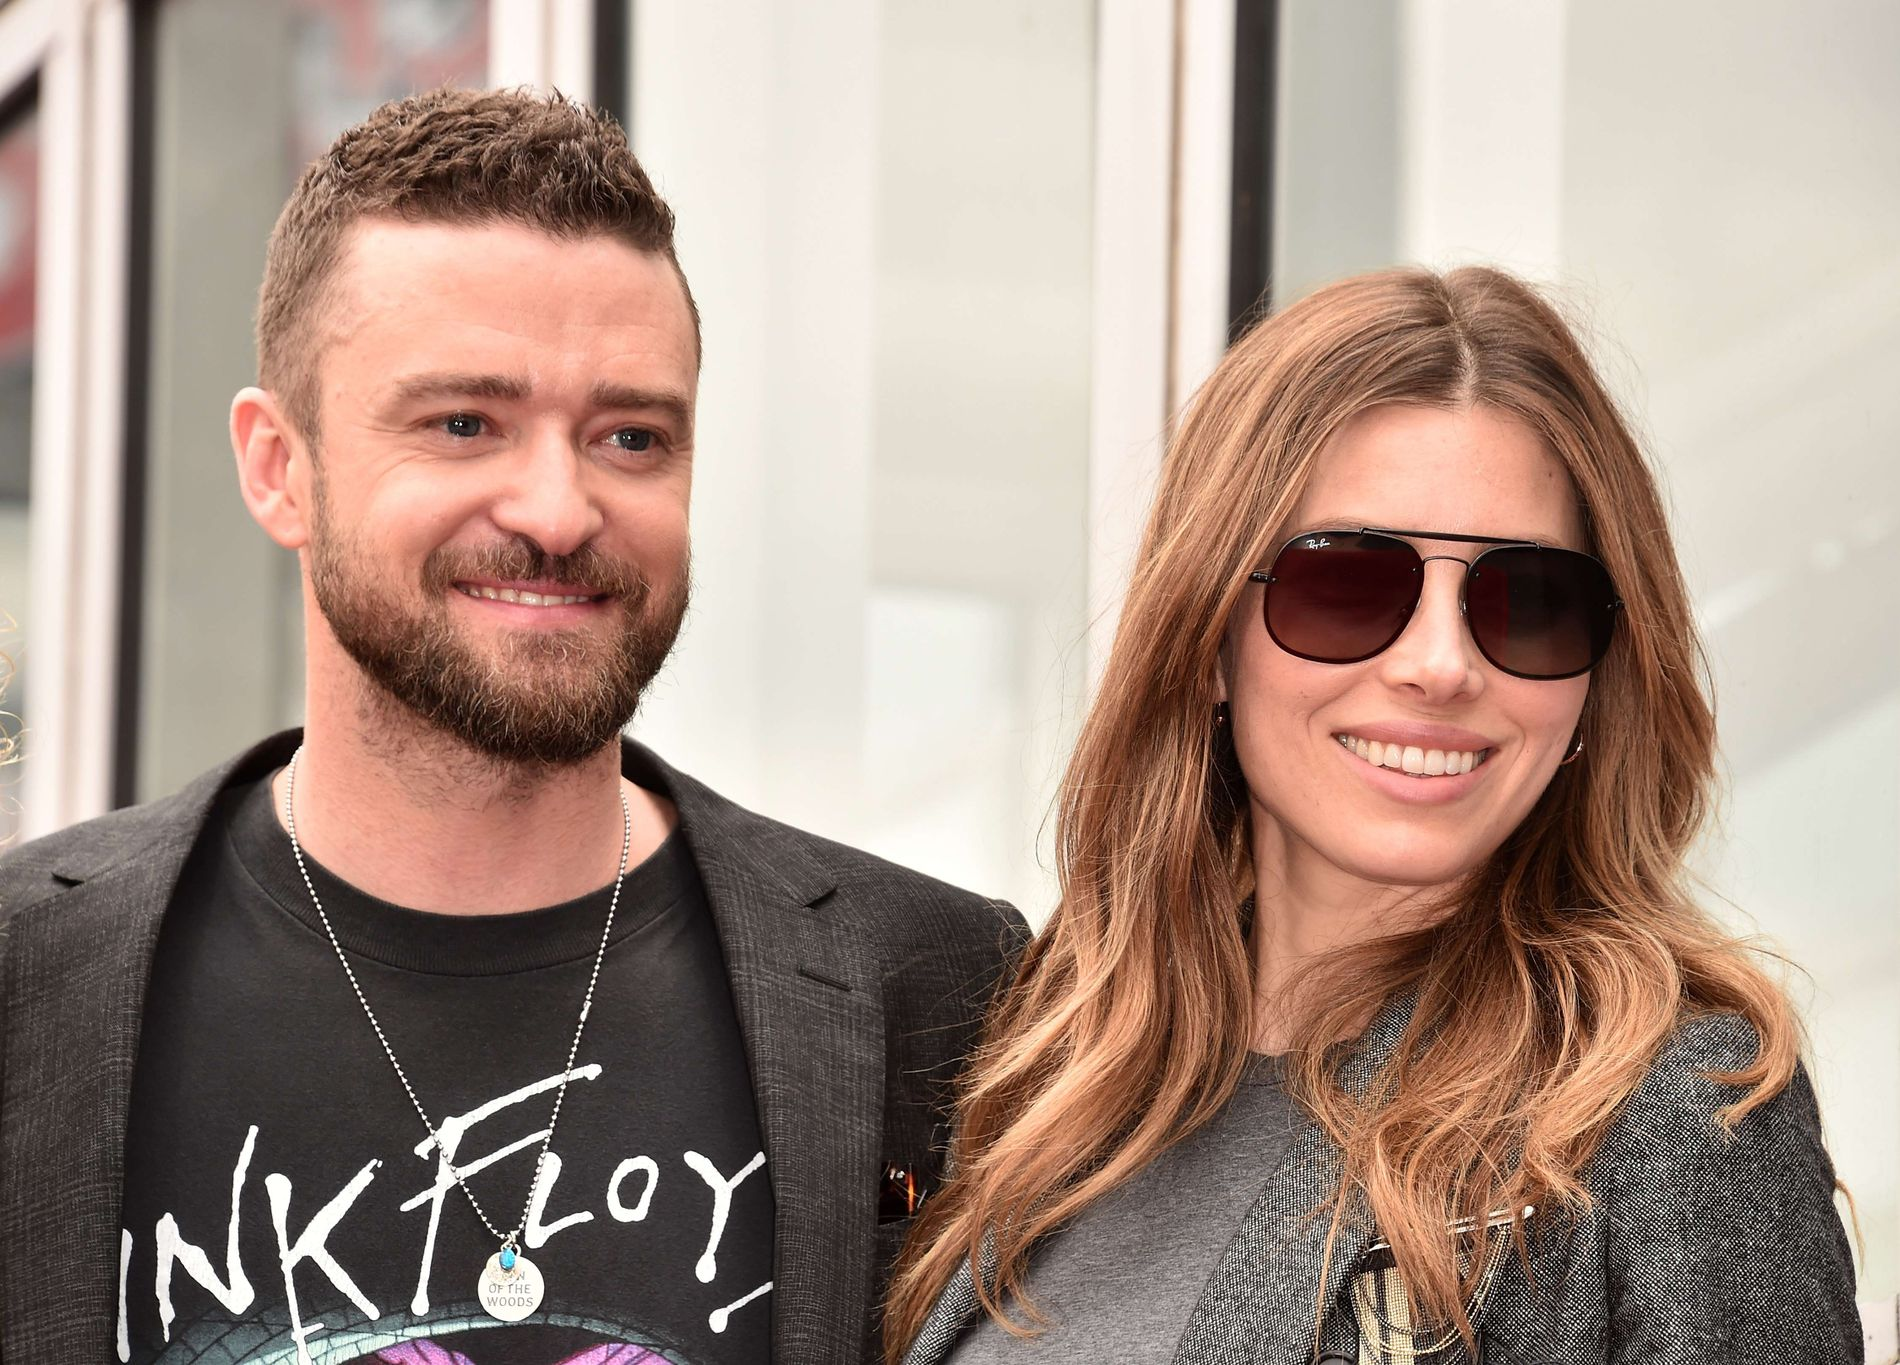 I SVERIGE: Popartisten Justin Timberlake (37) er gift med den amerikanske skuespilleren Jessica Biel (36). Her er de avbildet i Hollywood i april.